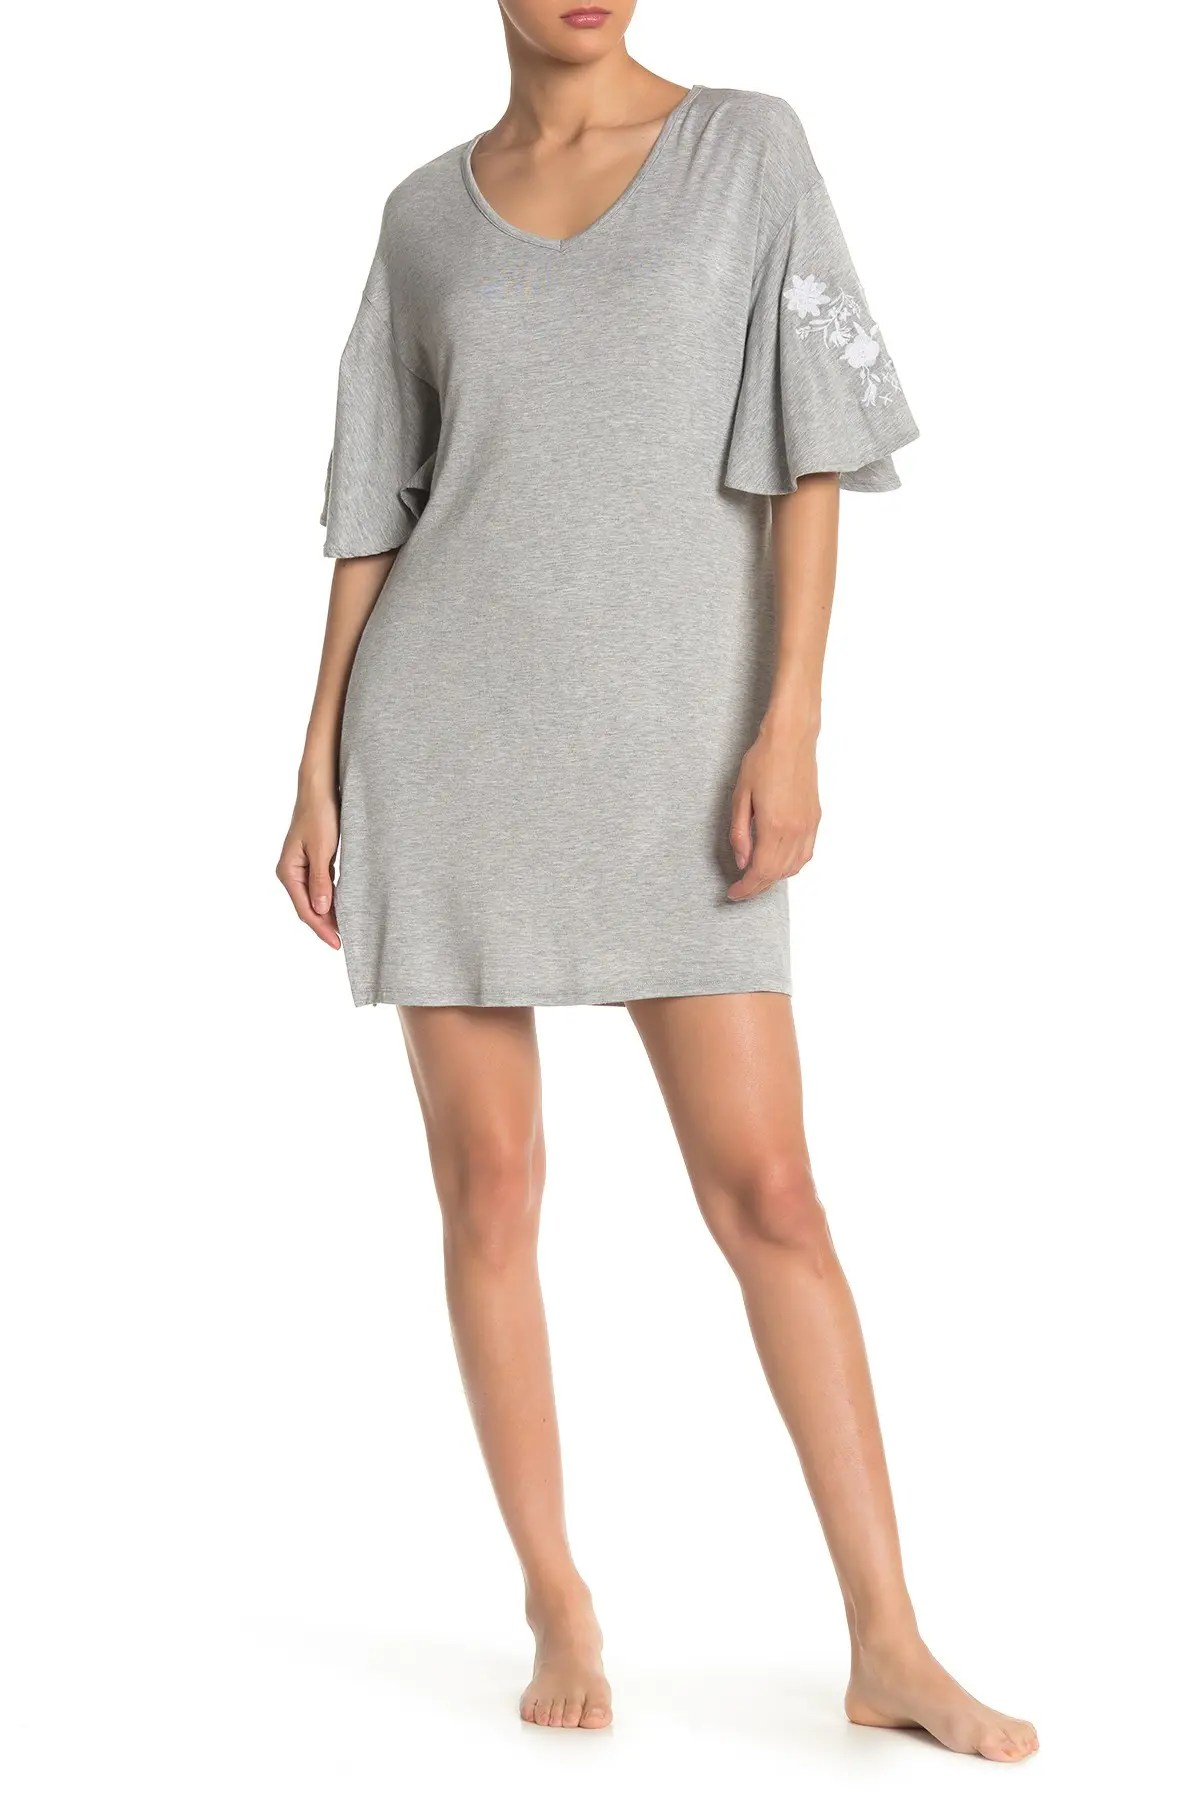 women s nightgowns nightshirts